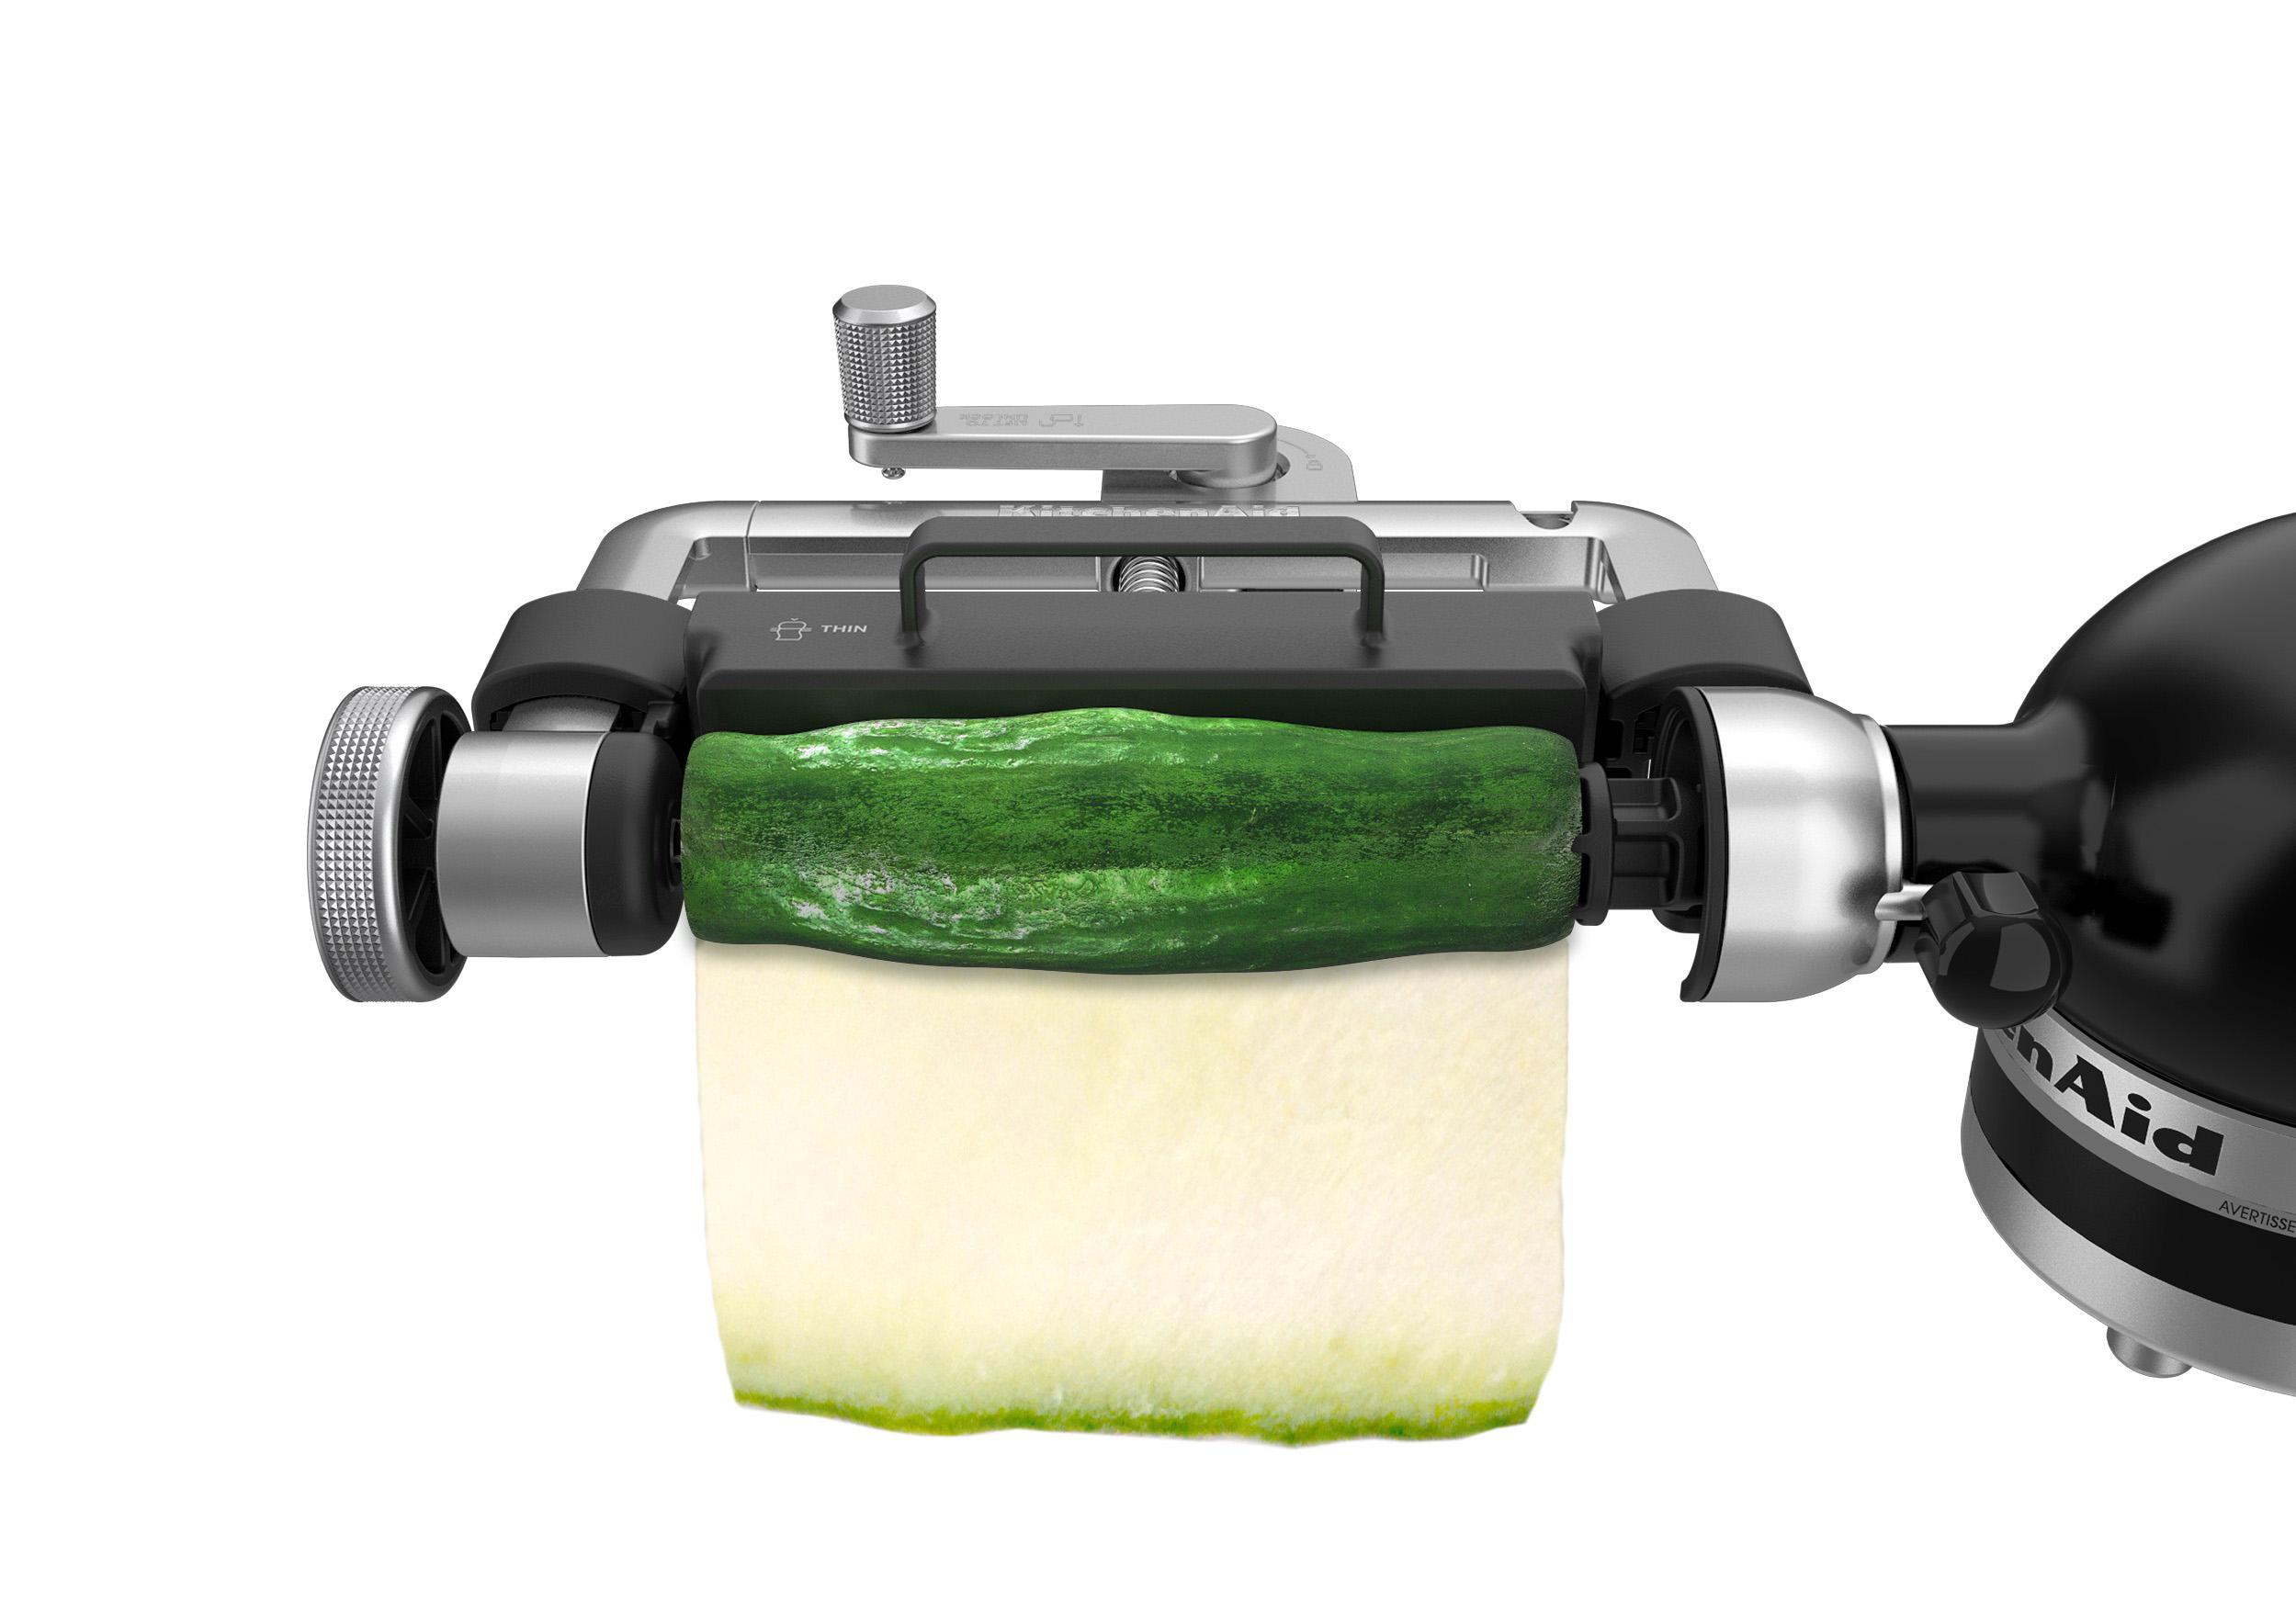 kitchenaid vegetable sheet cutter. new kitchenaid® vegetable sheet cutter attachment kitchenaid t